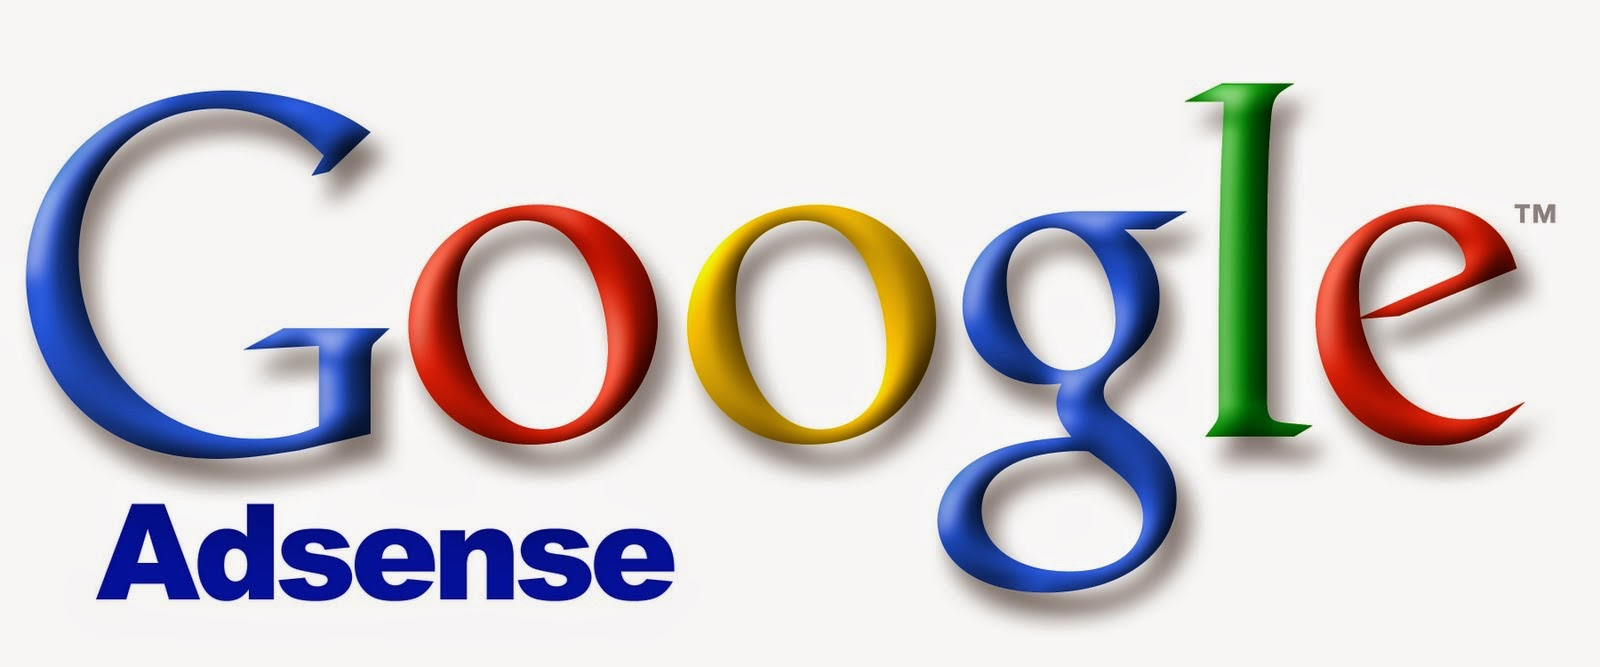 Things to consider before applying for Google Adsense Program